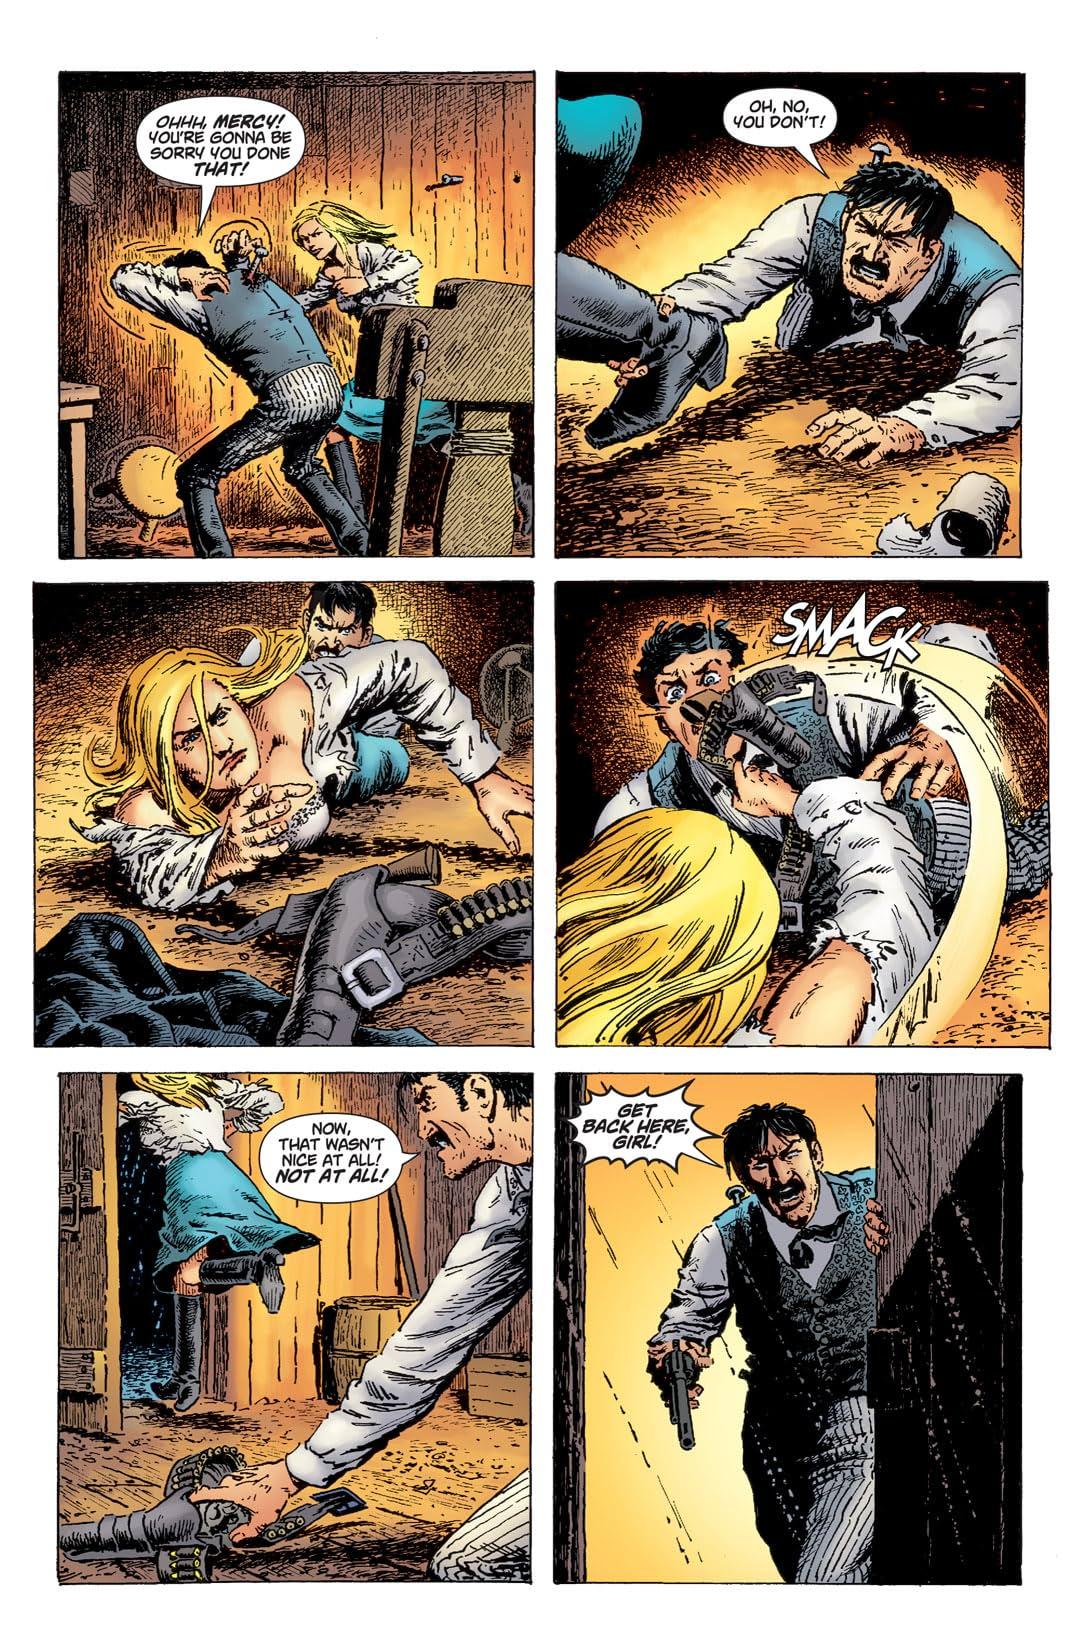 Bat Lash (2008) #2 (of 6)